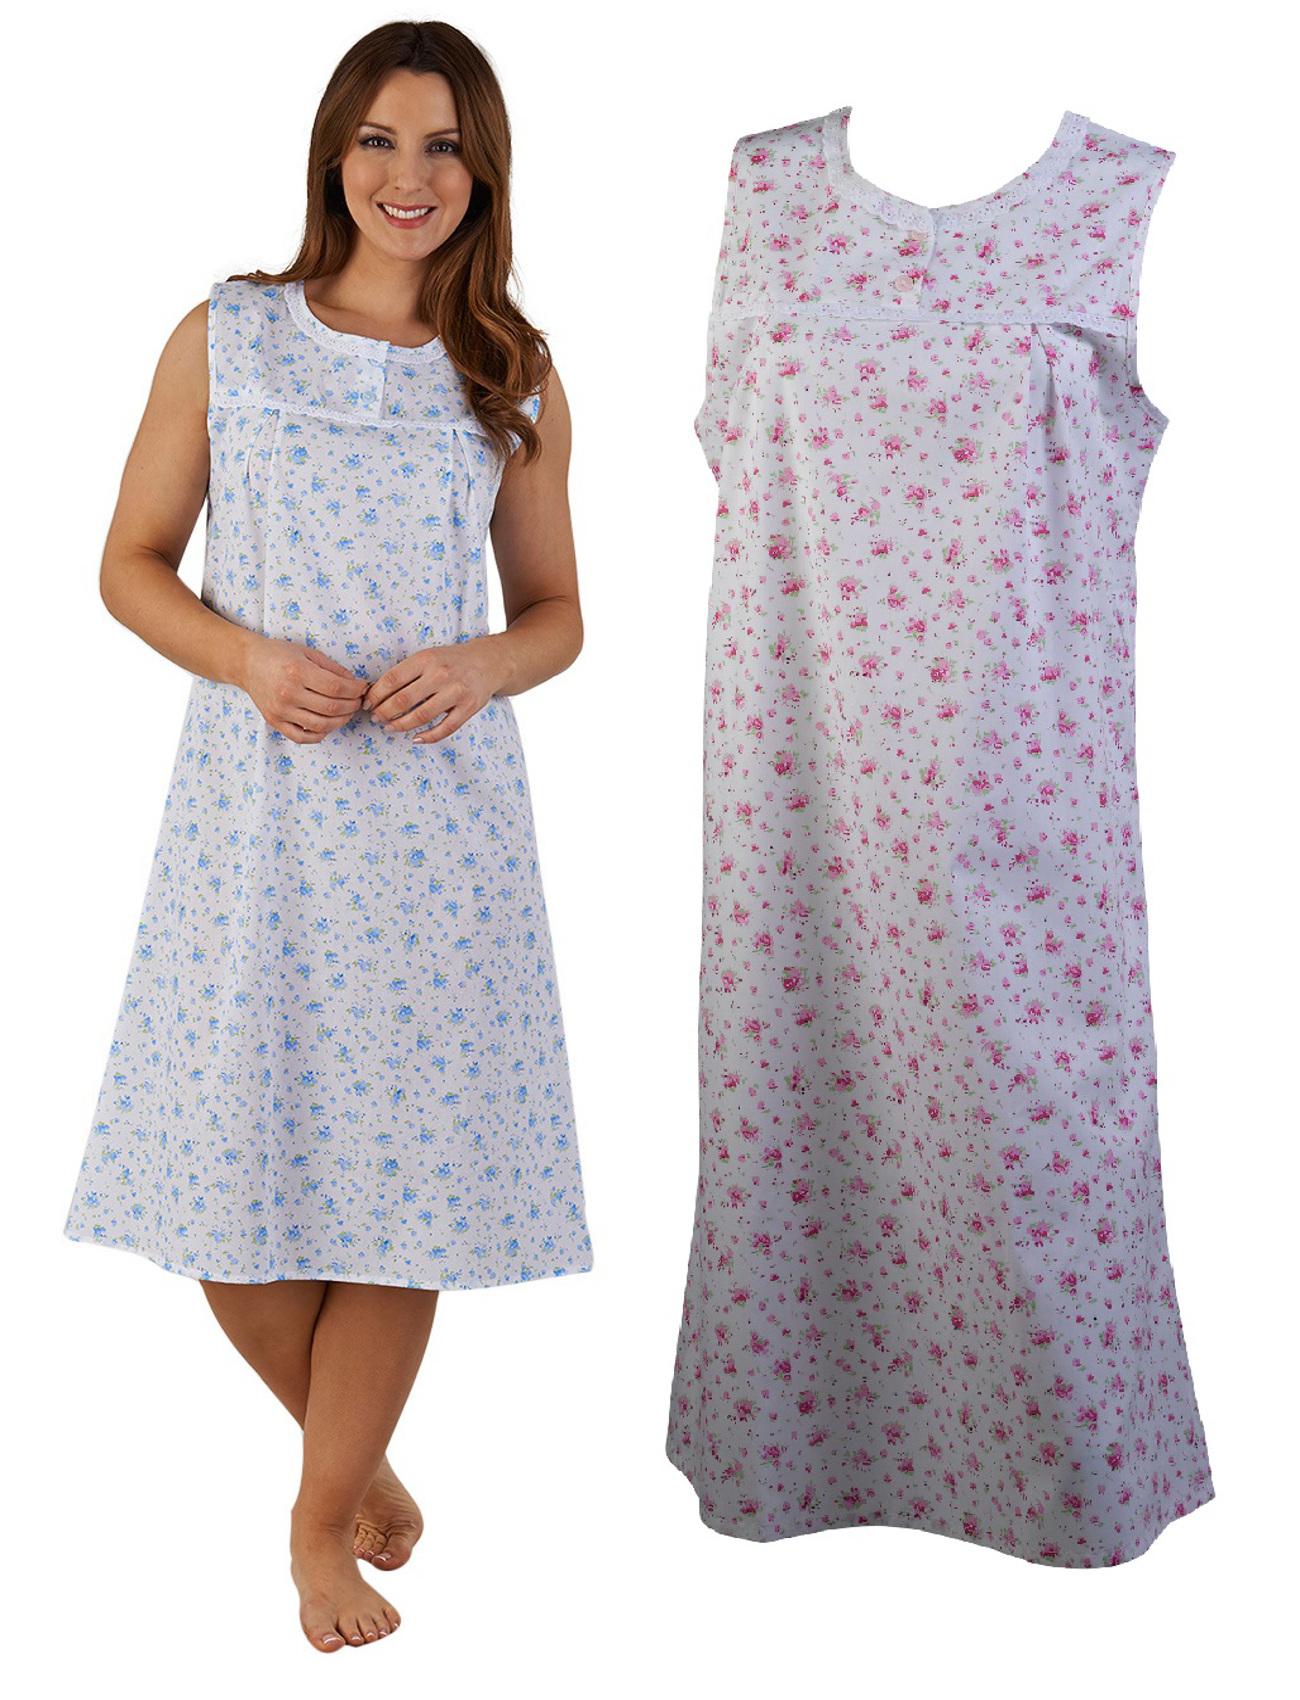 Night dress designs ladies